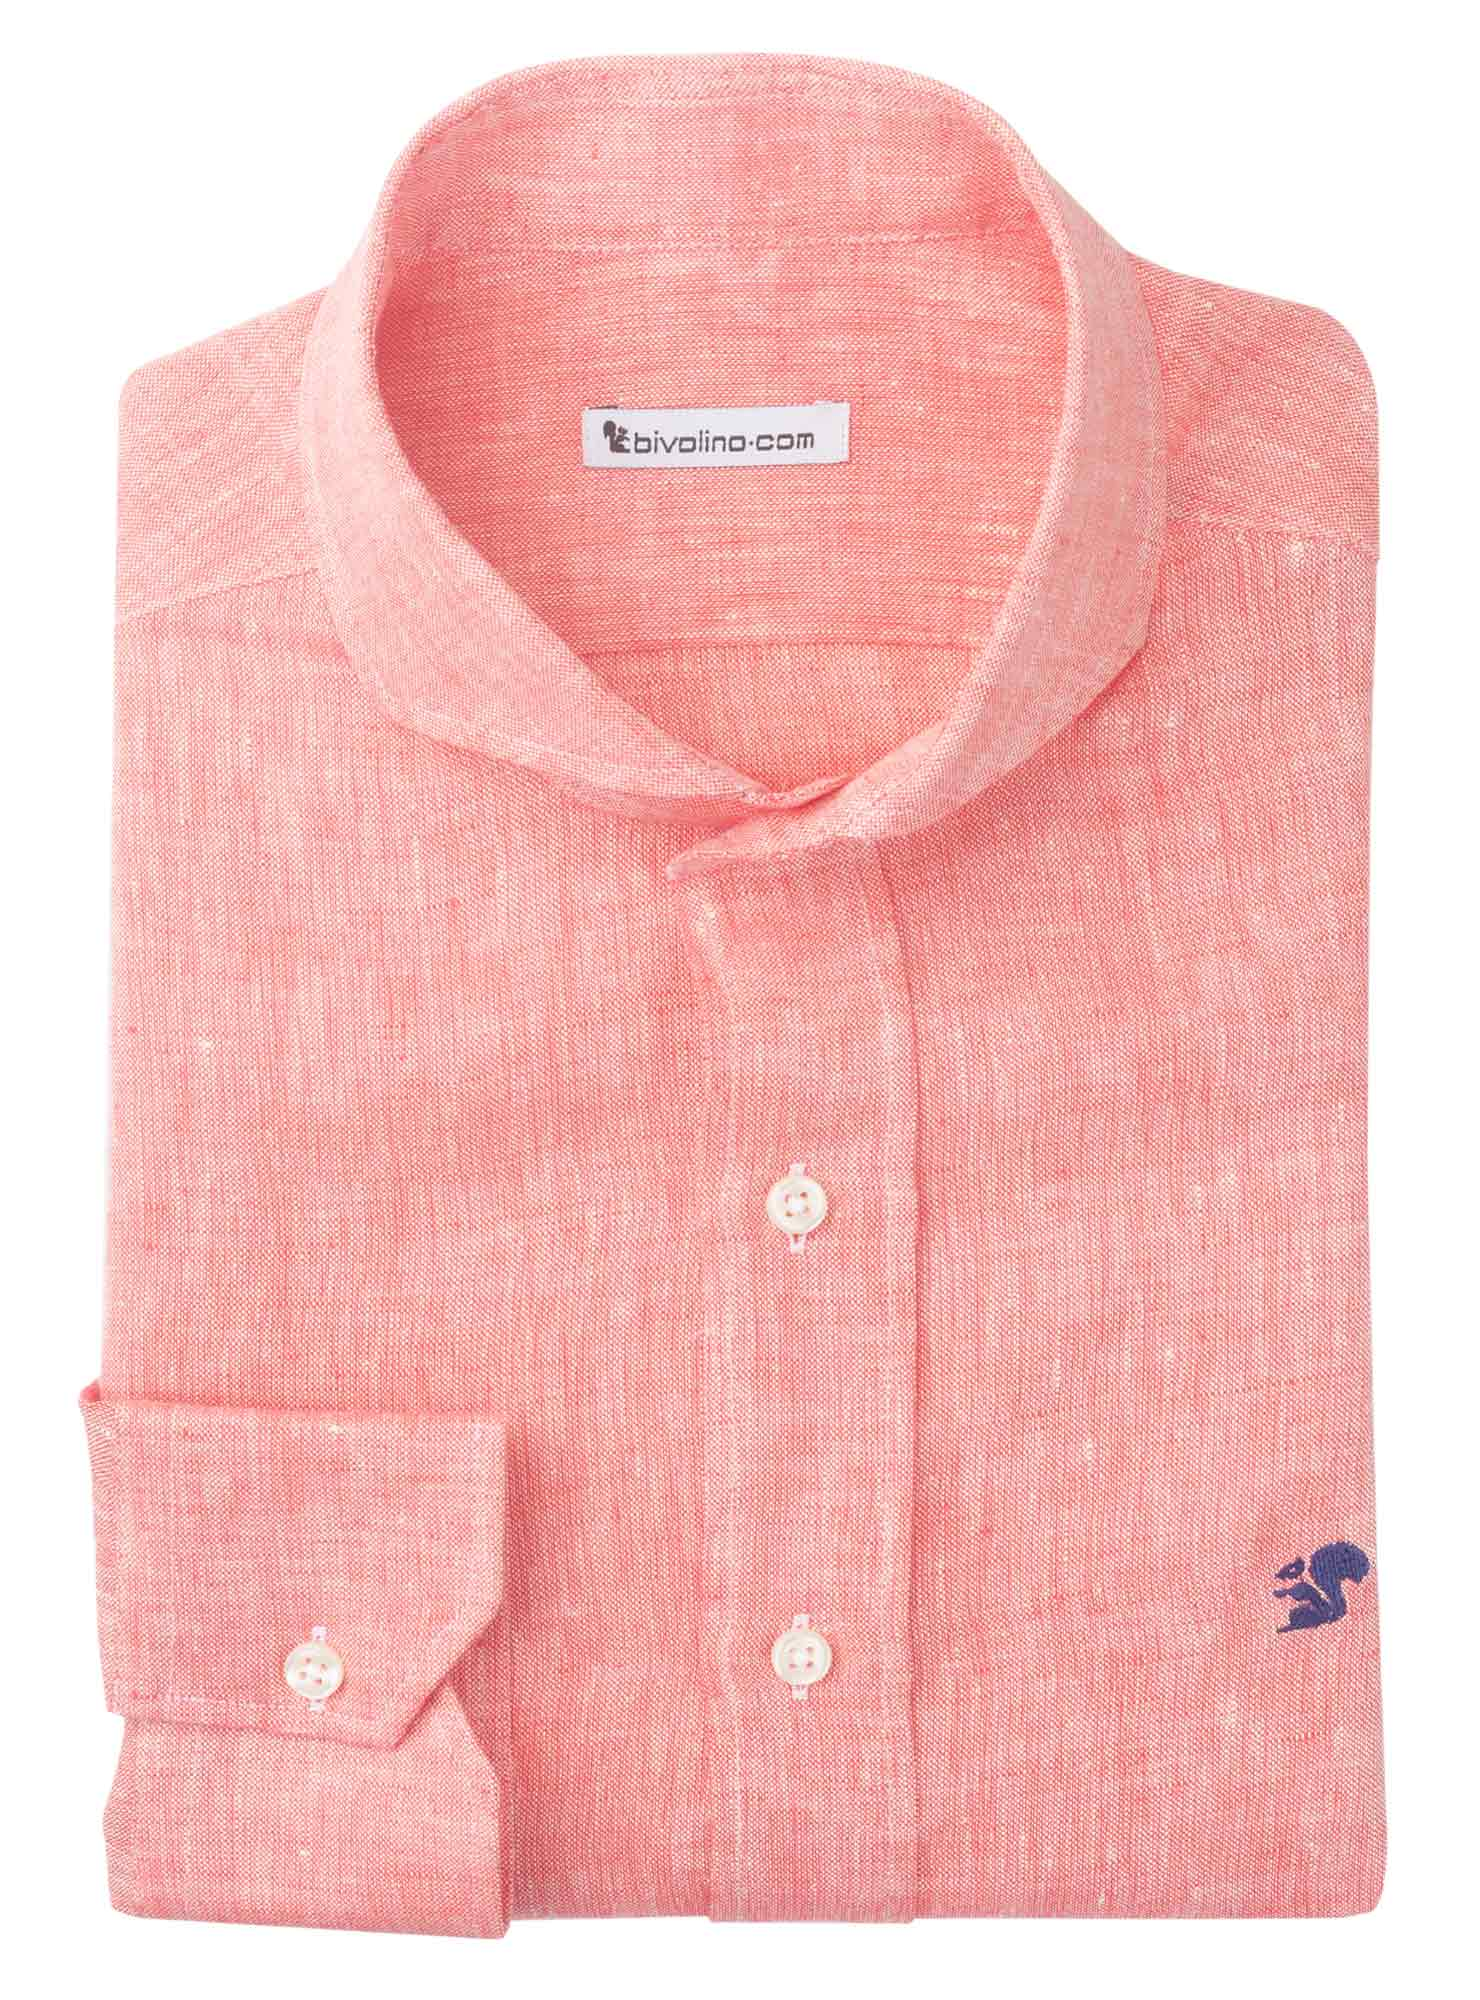 IGLESIAS - lino rosa liso camisa de hombre - SERA 5